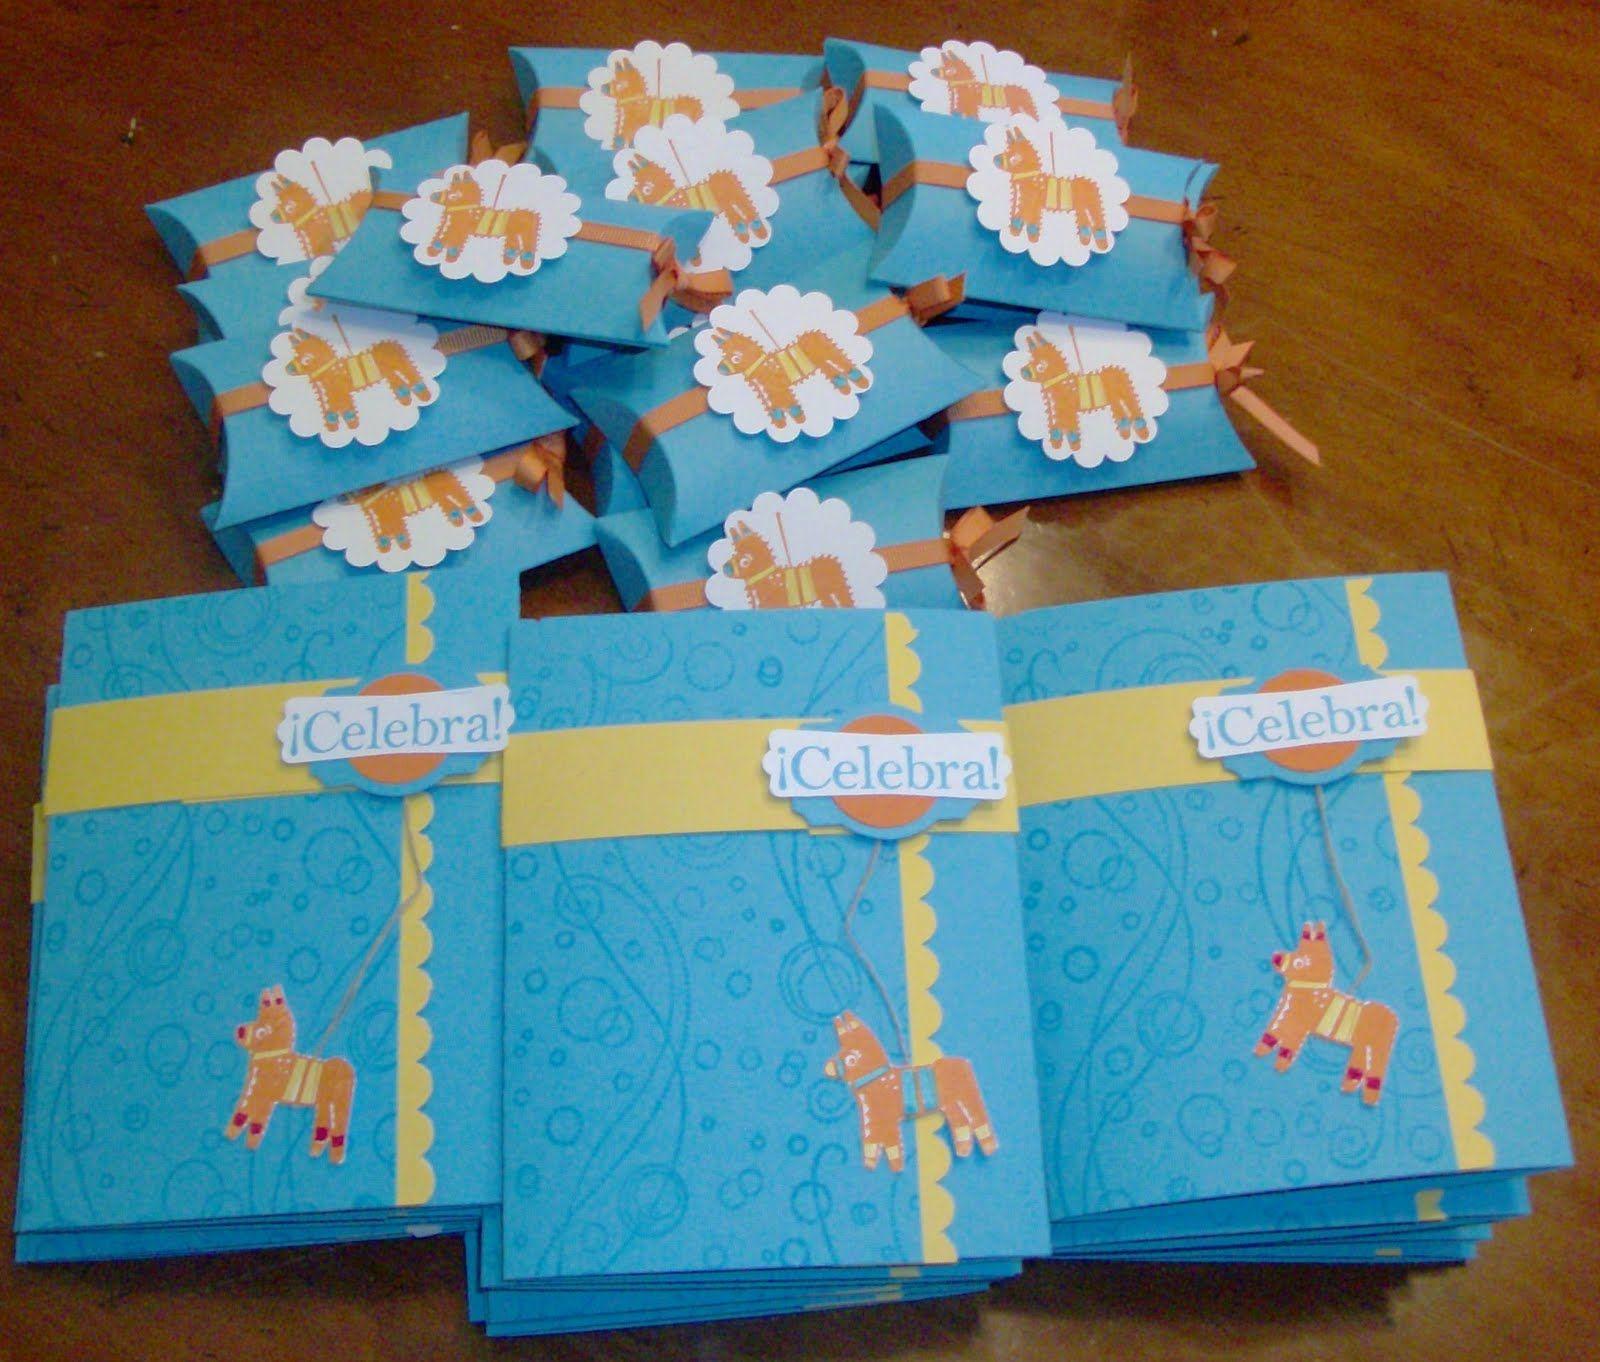 stampin up birthday invitation ideas | Paper Crafts | Pinterest ...